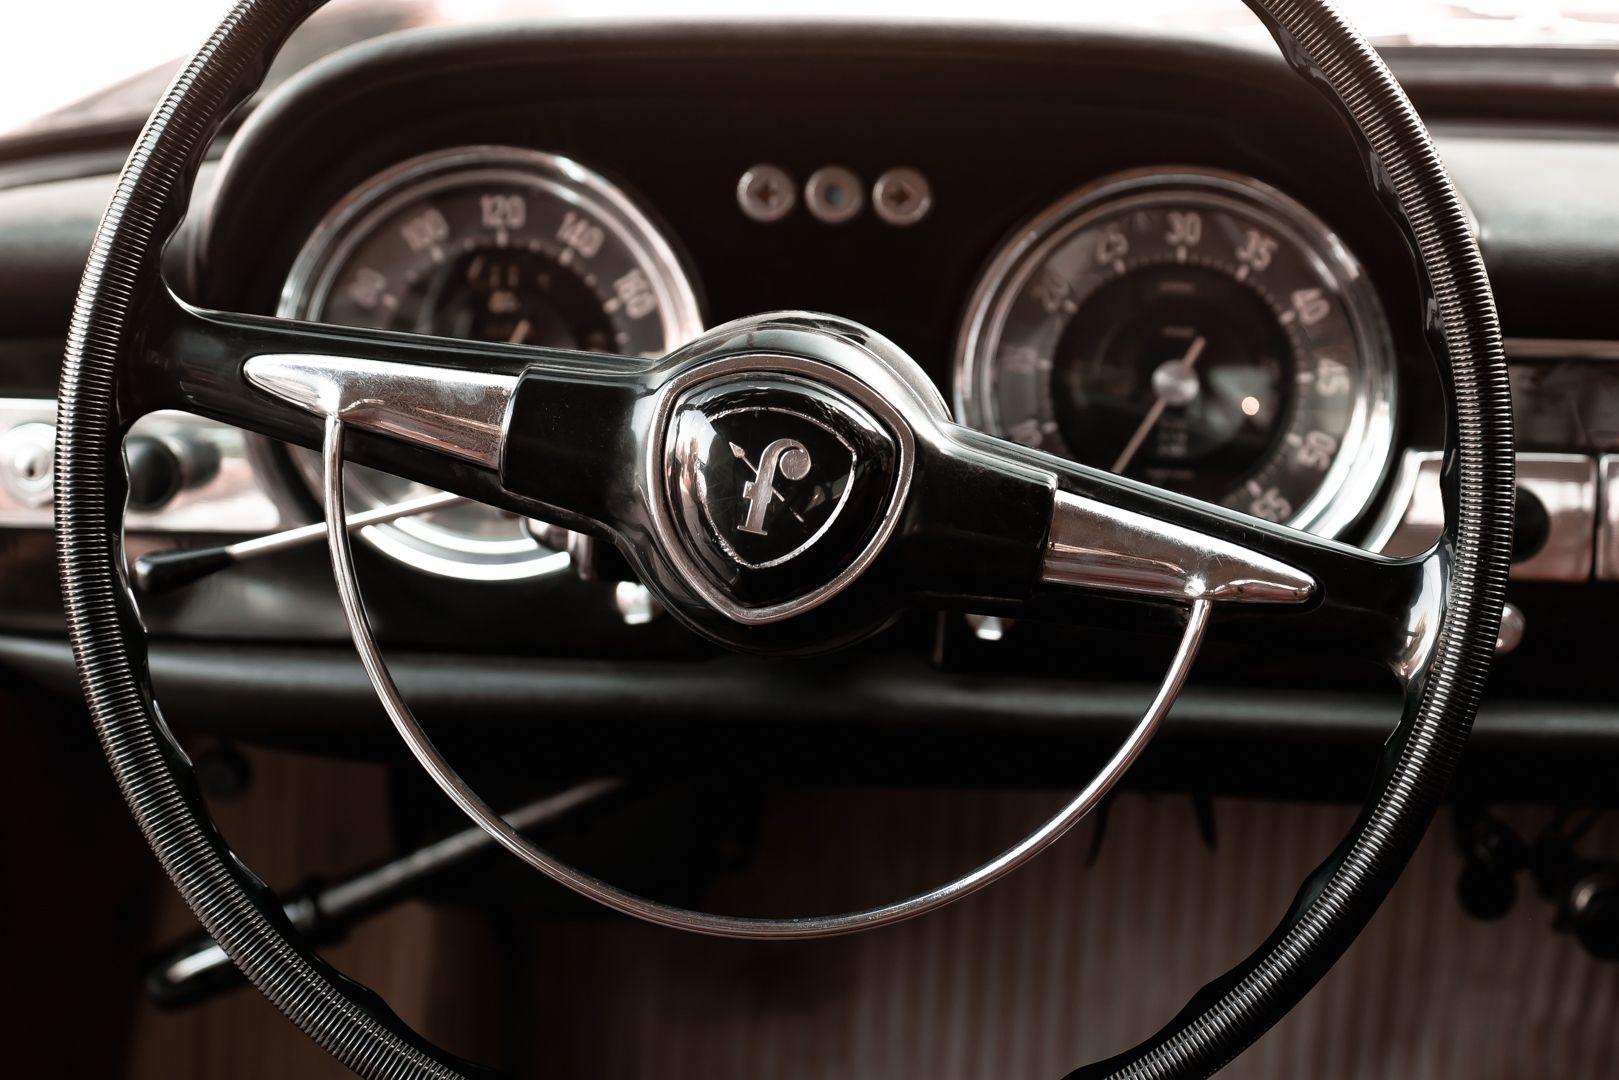 1960 Lancia Flaminia Coupé Pininfarina 2.5 76068